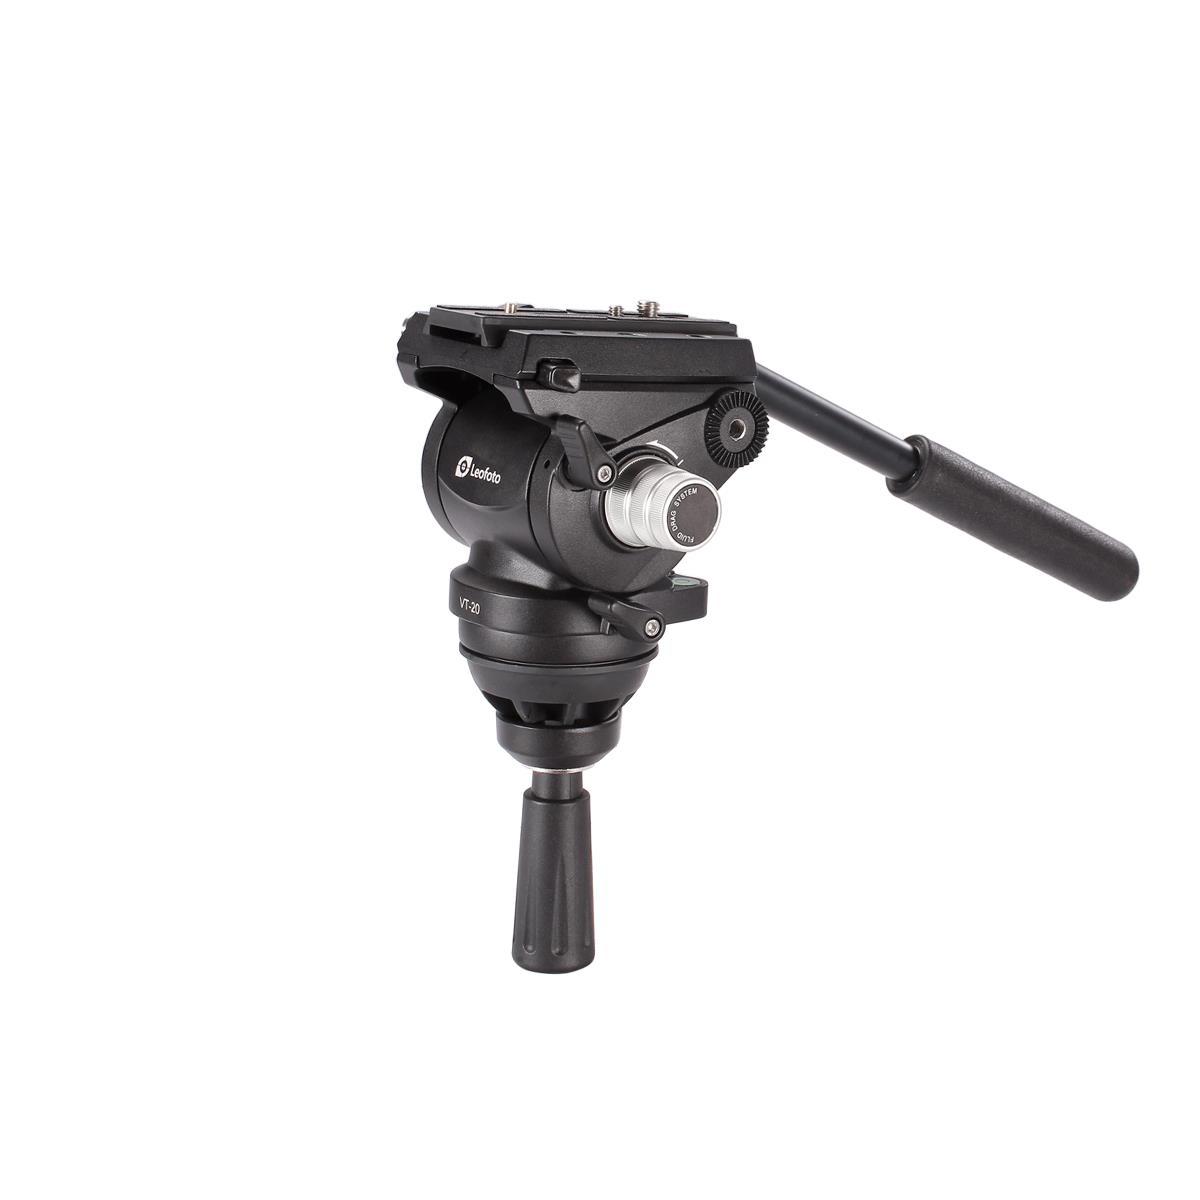 Leofoto Fluid-Videokopf VT-20 mit Halbkugel 80 mm